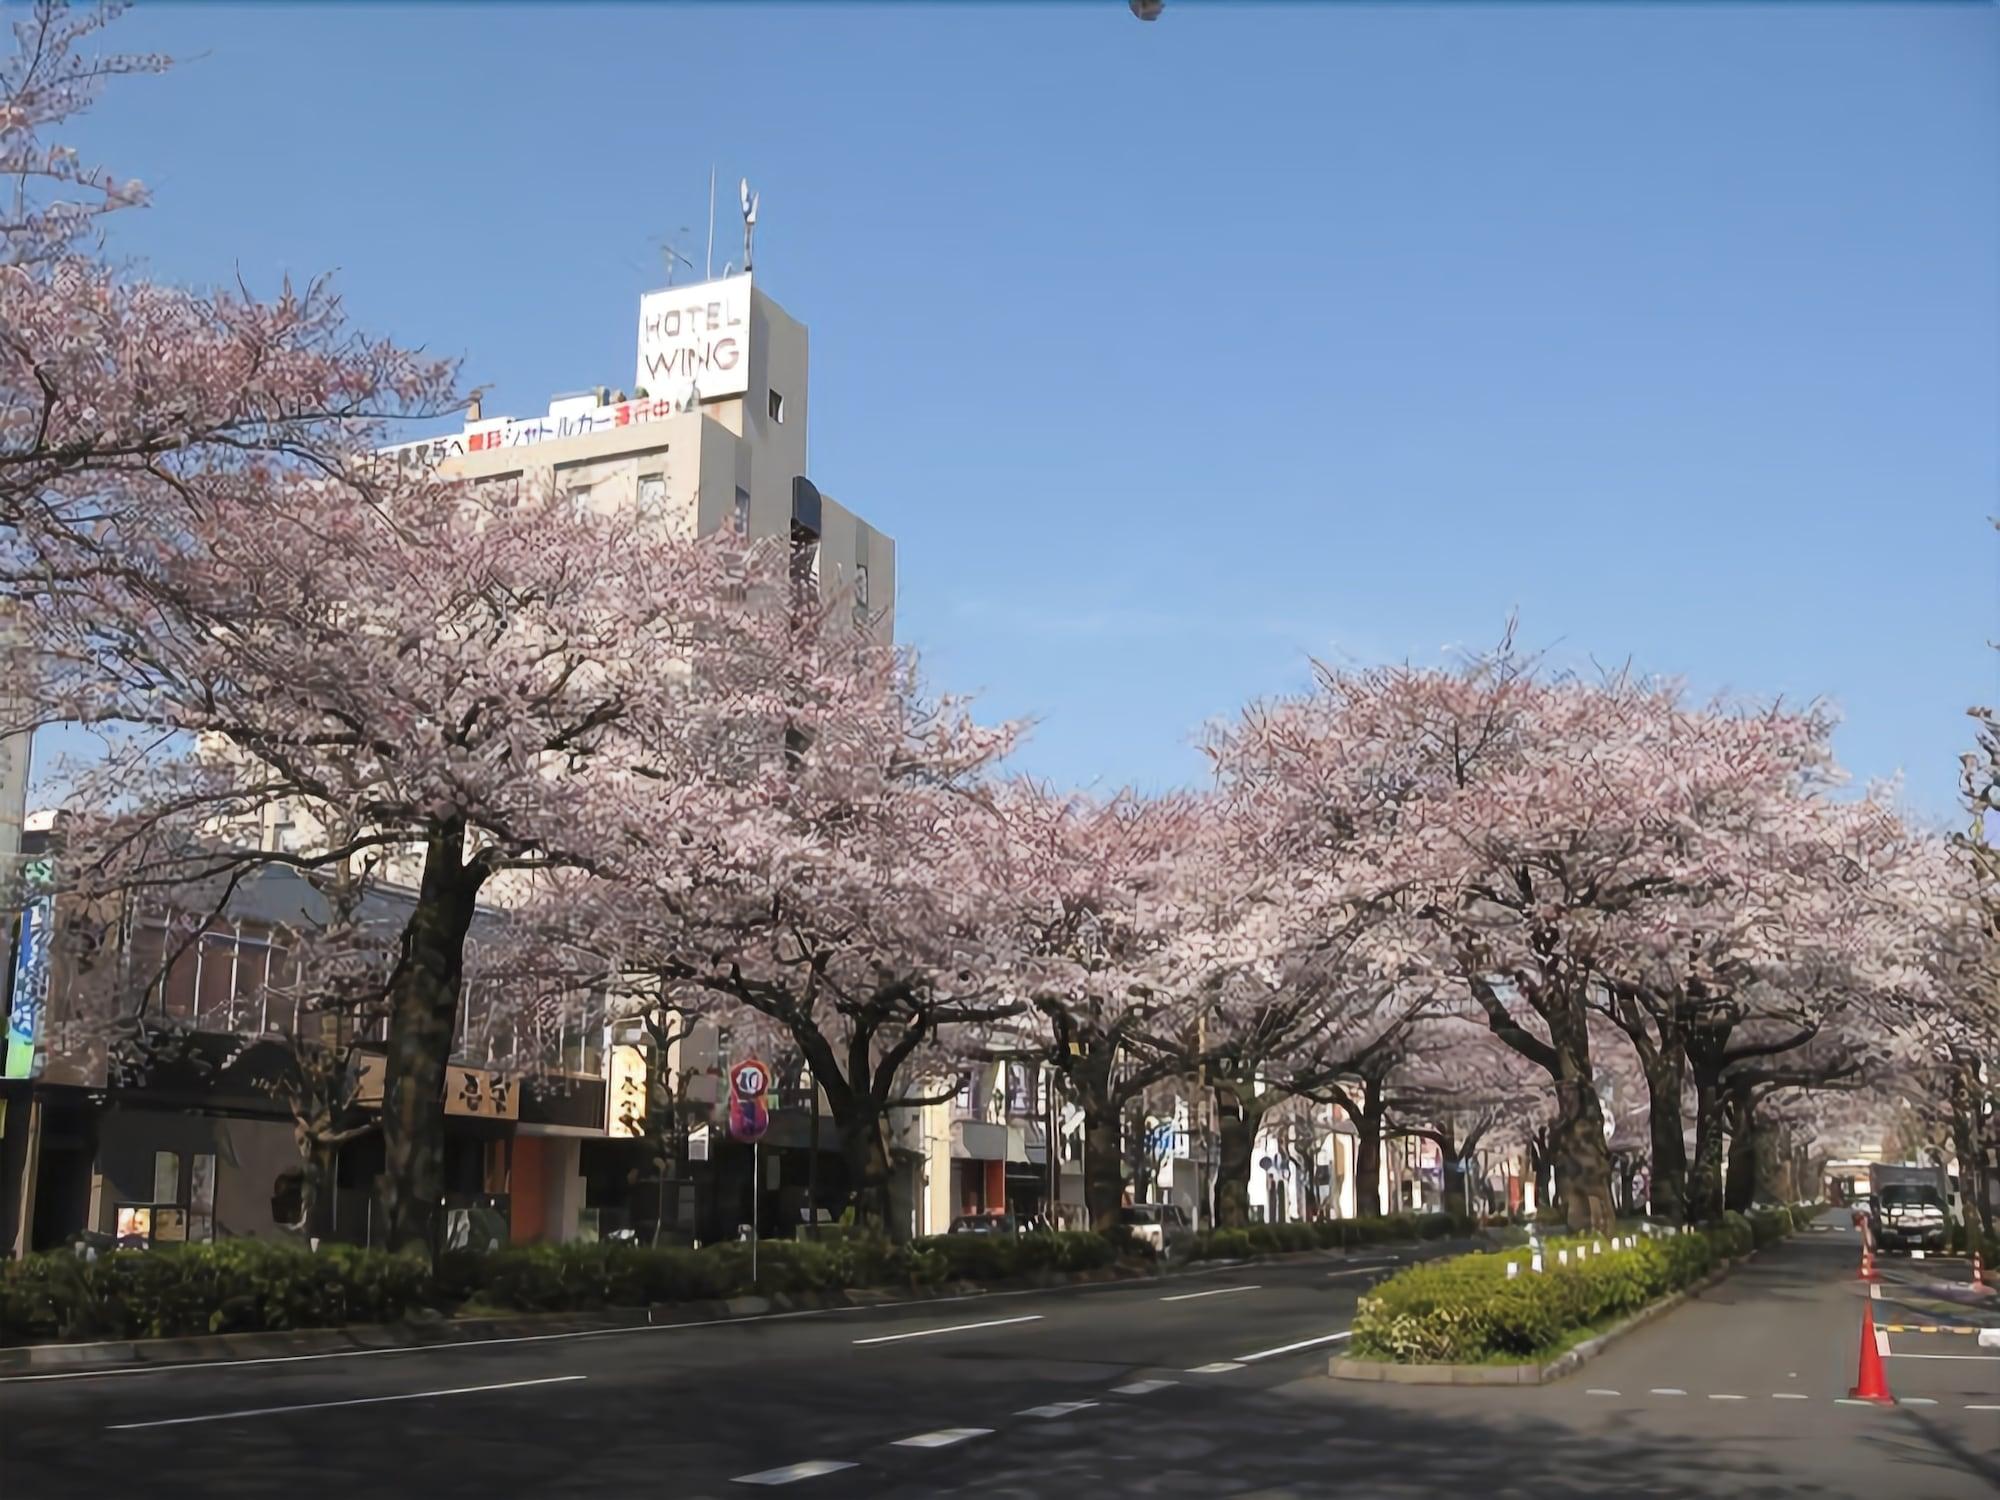 Hotel Wing International Hitachi, Hitachi